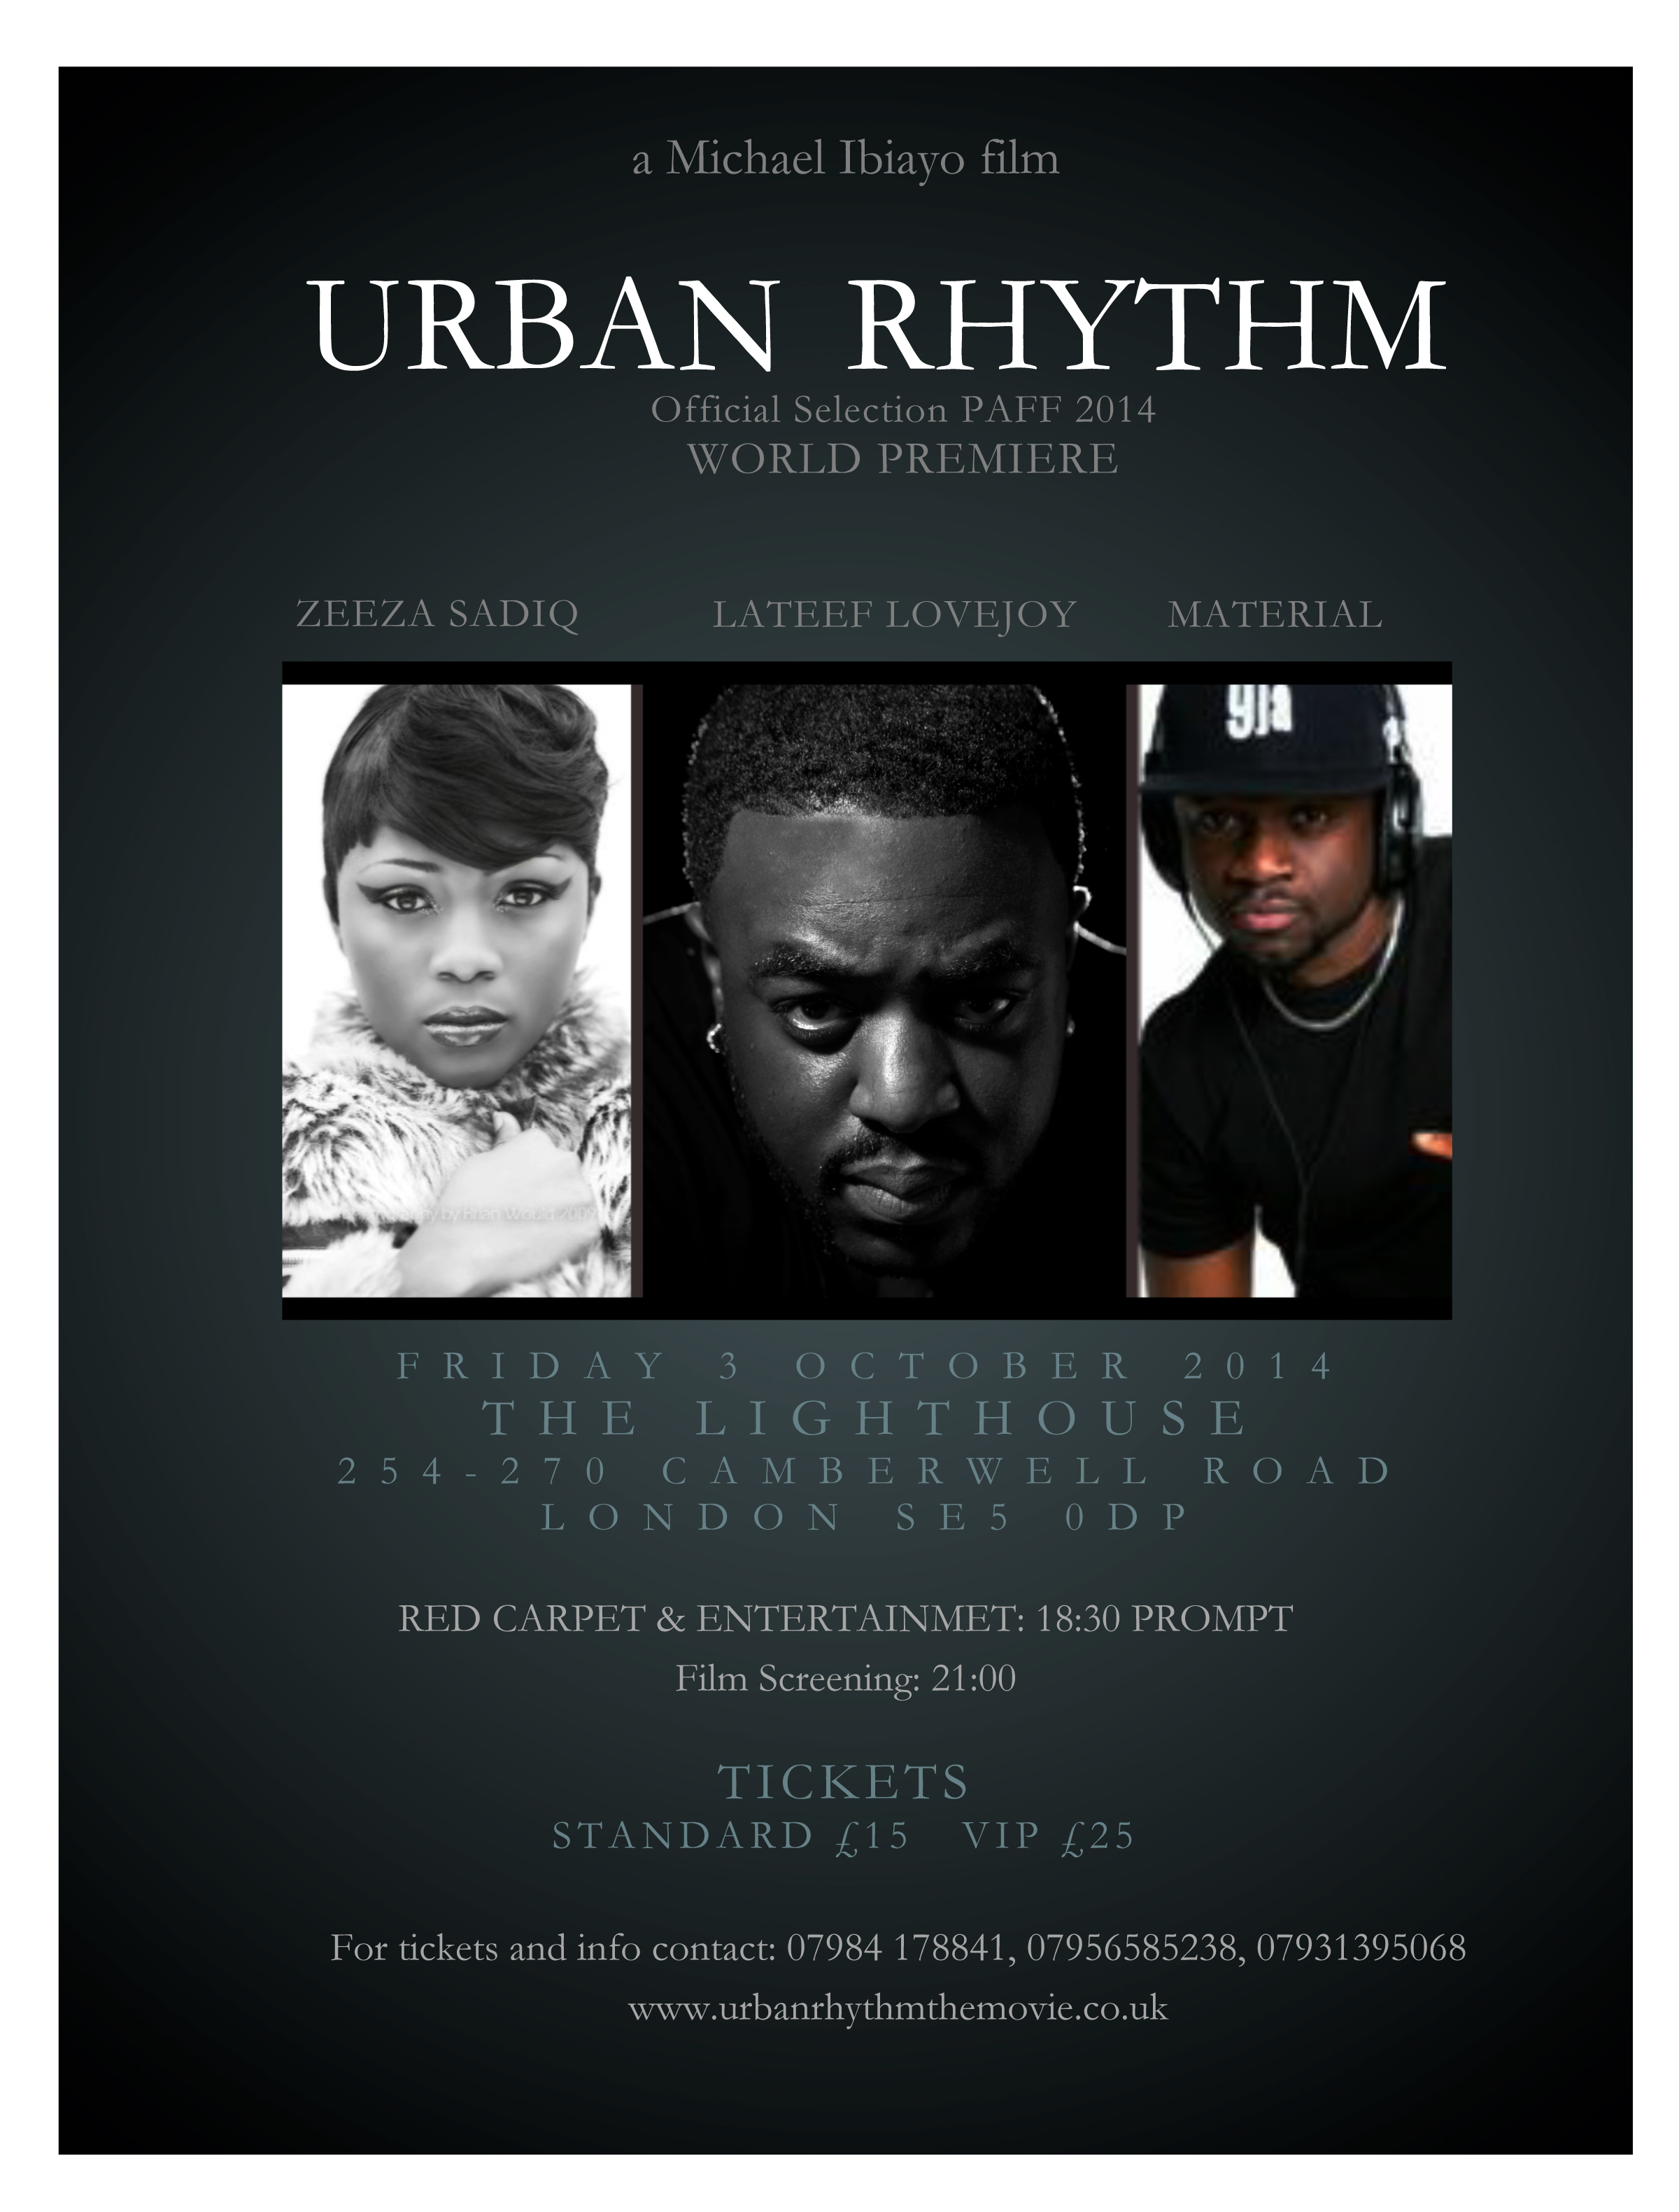 Poster design microsoft - Microsoft Word Urban Rhythm New Poster Design Docx